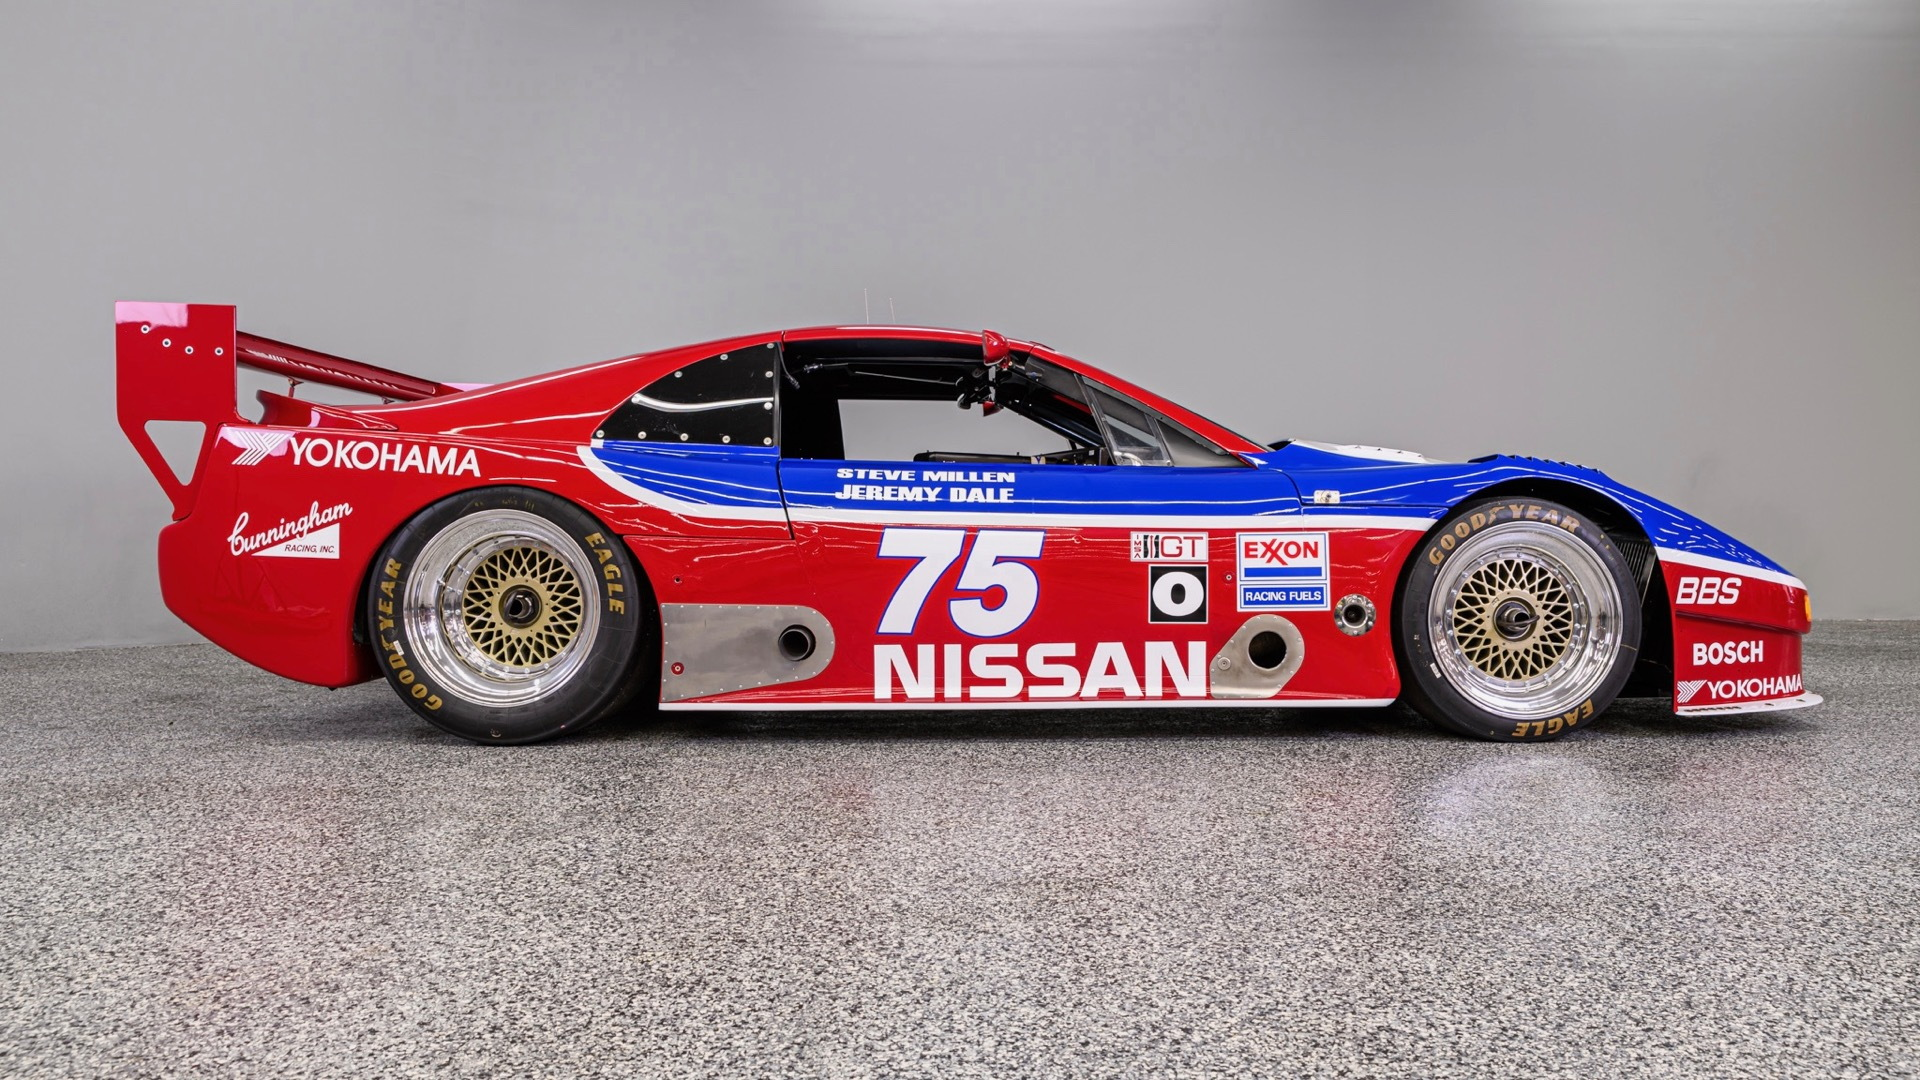 1990 Nissan 300ZX Twin Turbo IMSA GTO race car (Photo by Bring a Trailer)